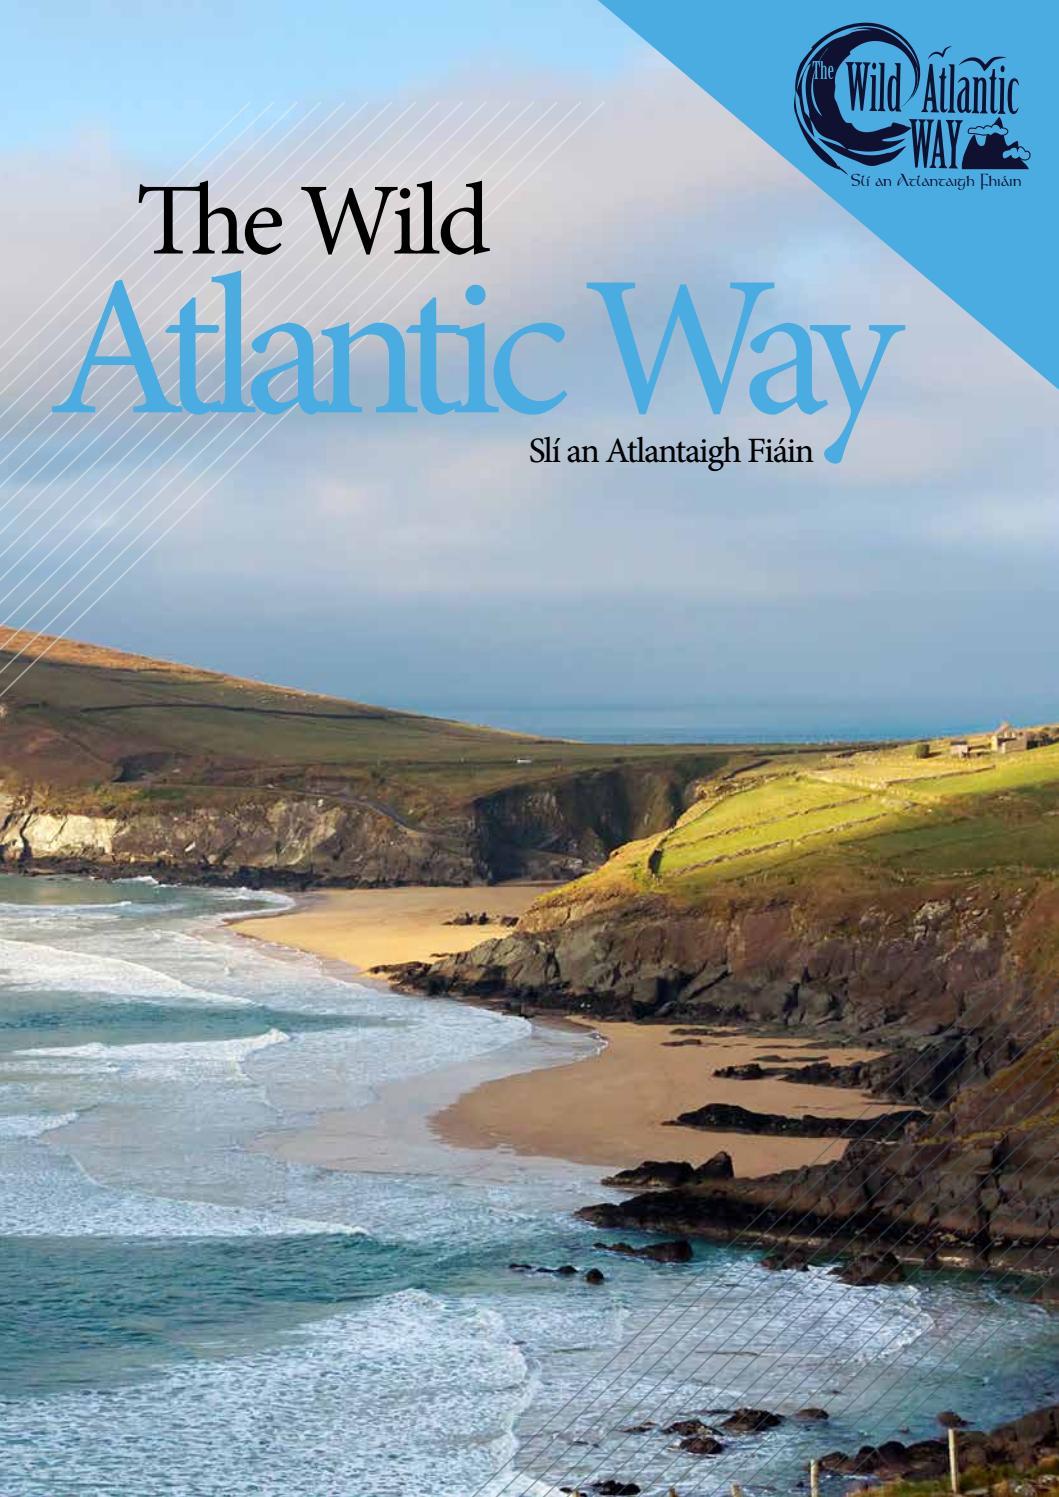 Wild Atlantic Way 2018 by guerinmediaireland - issuu